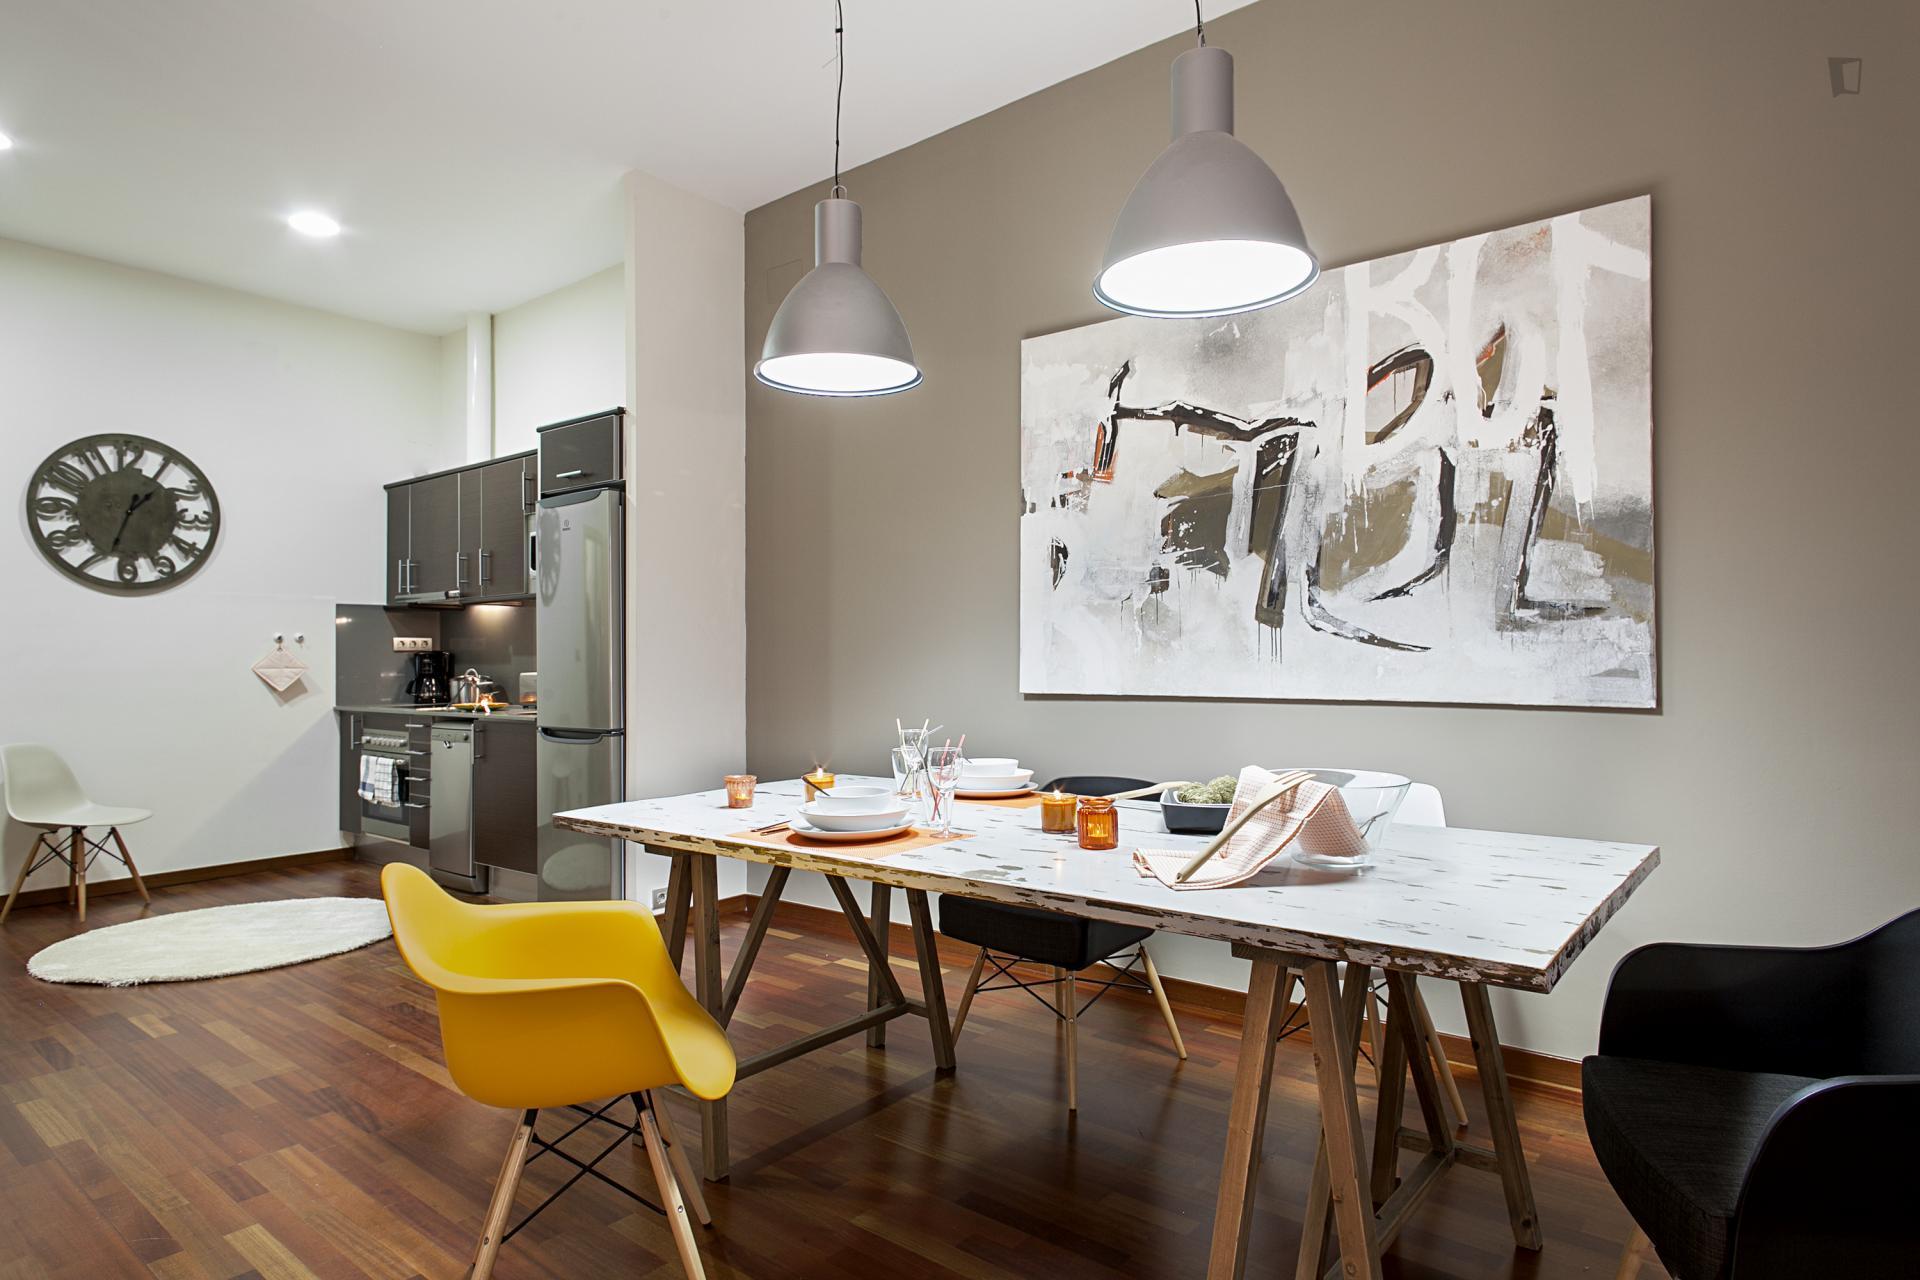 Portaferrissa - Modern furnished studio in Barcelona